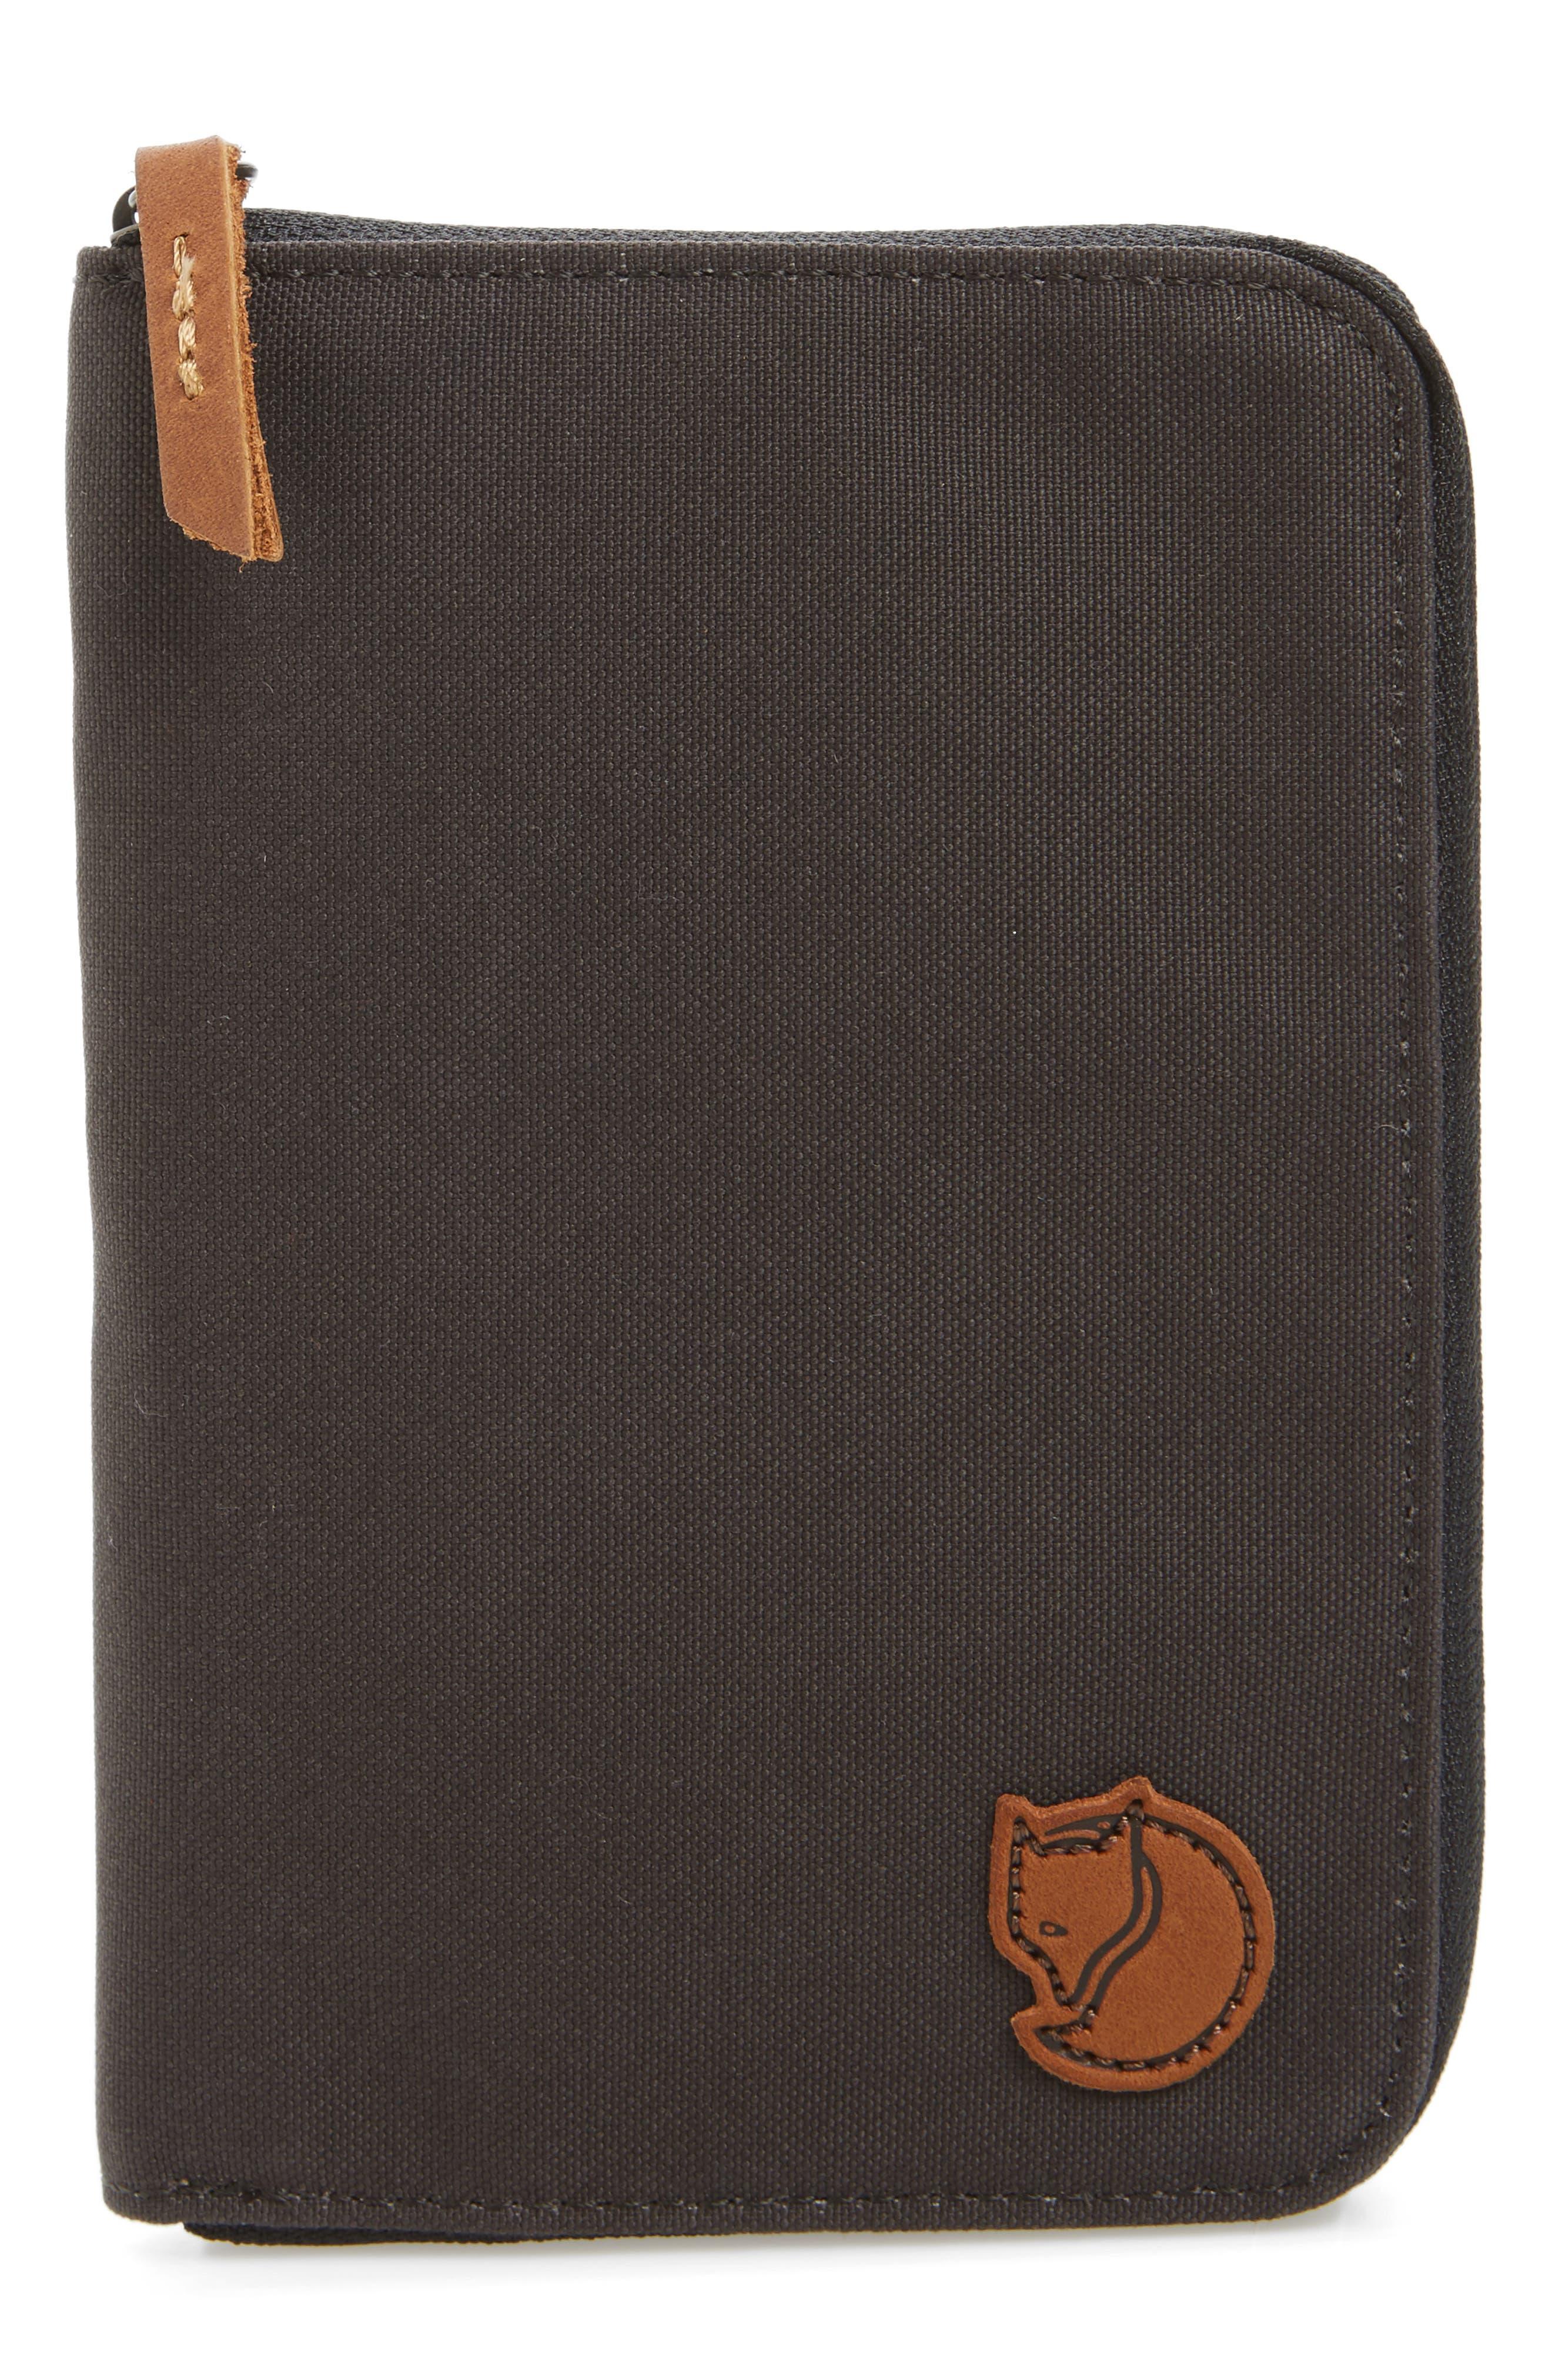 Canvas Passport Wallet,                             Main thumbnail 1, color,                             024